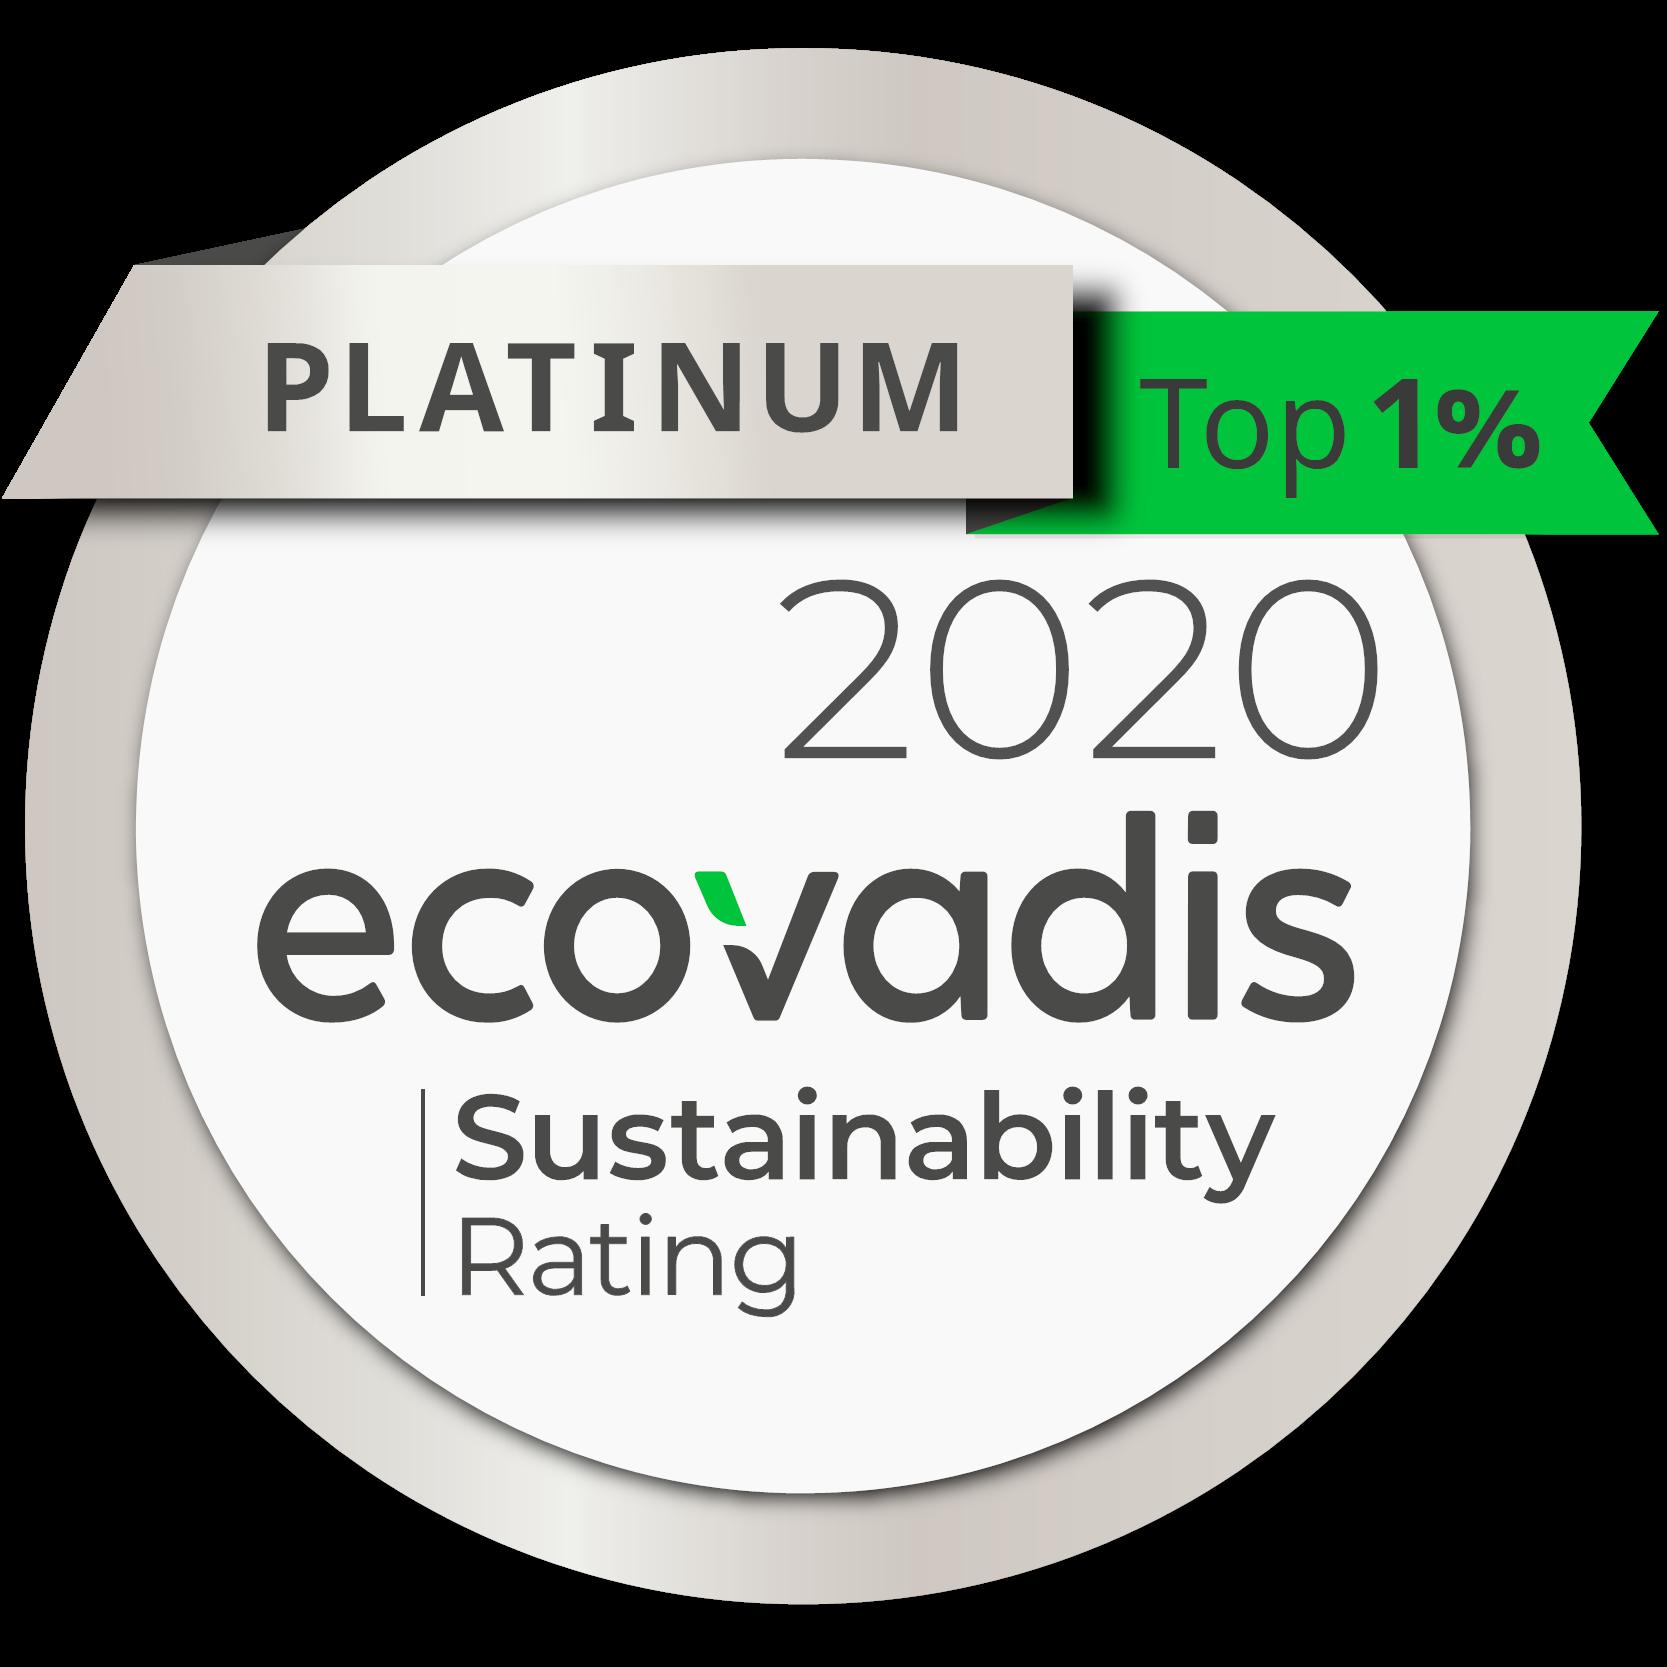 EcoVadis Platinum medal